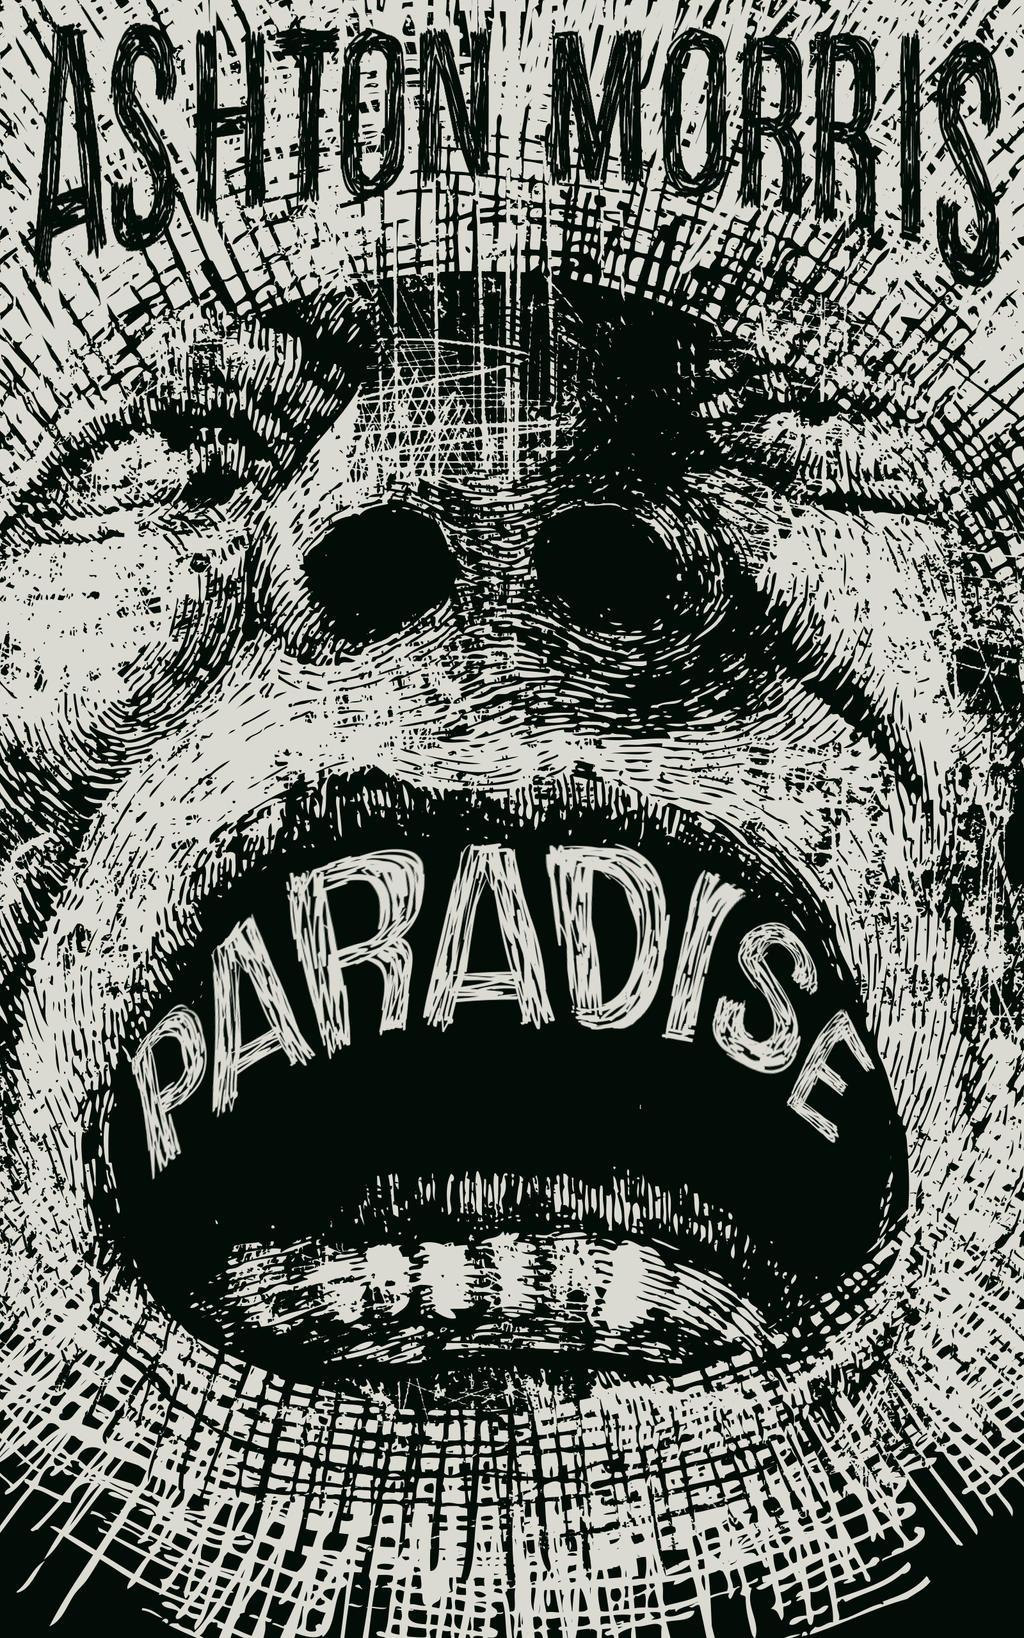 Book Cover Design Deviantart : Book cover design for paradise by ebooklaunch on deviantart